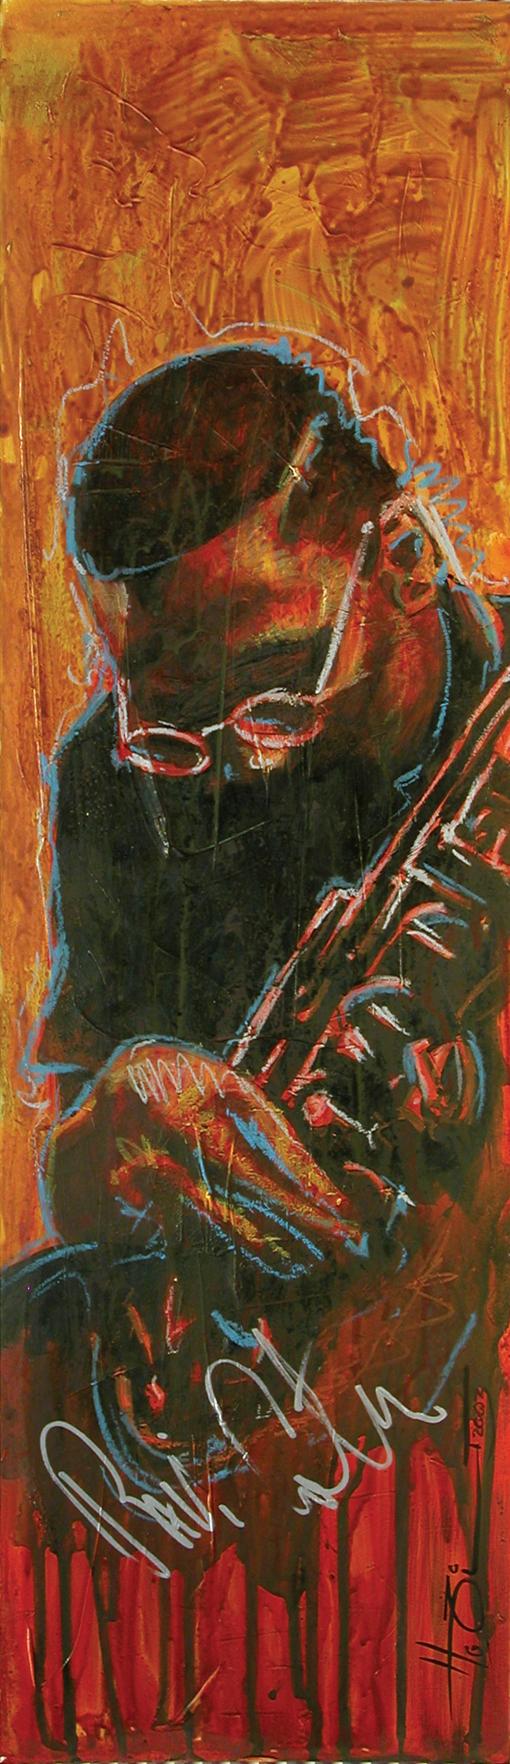 Ravi Coltrane acryl on cardboard